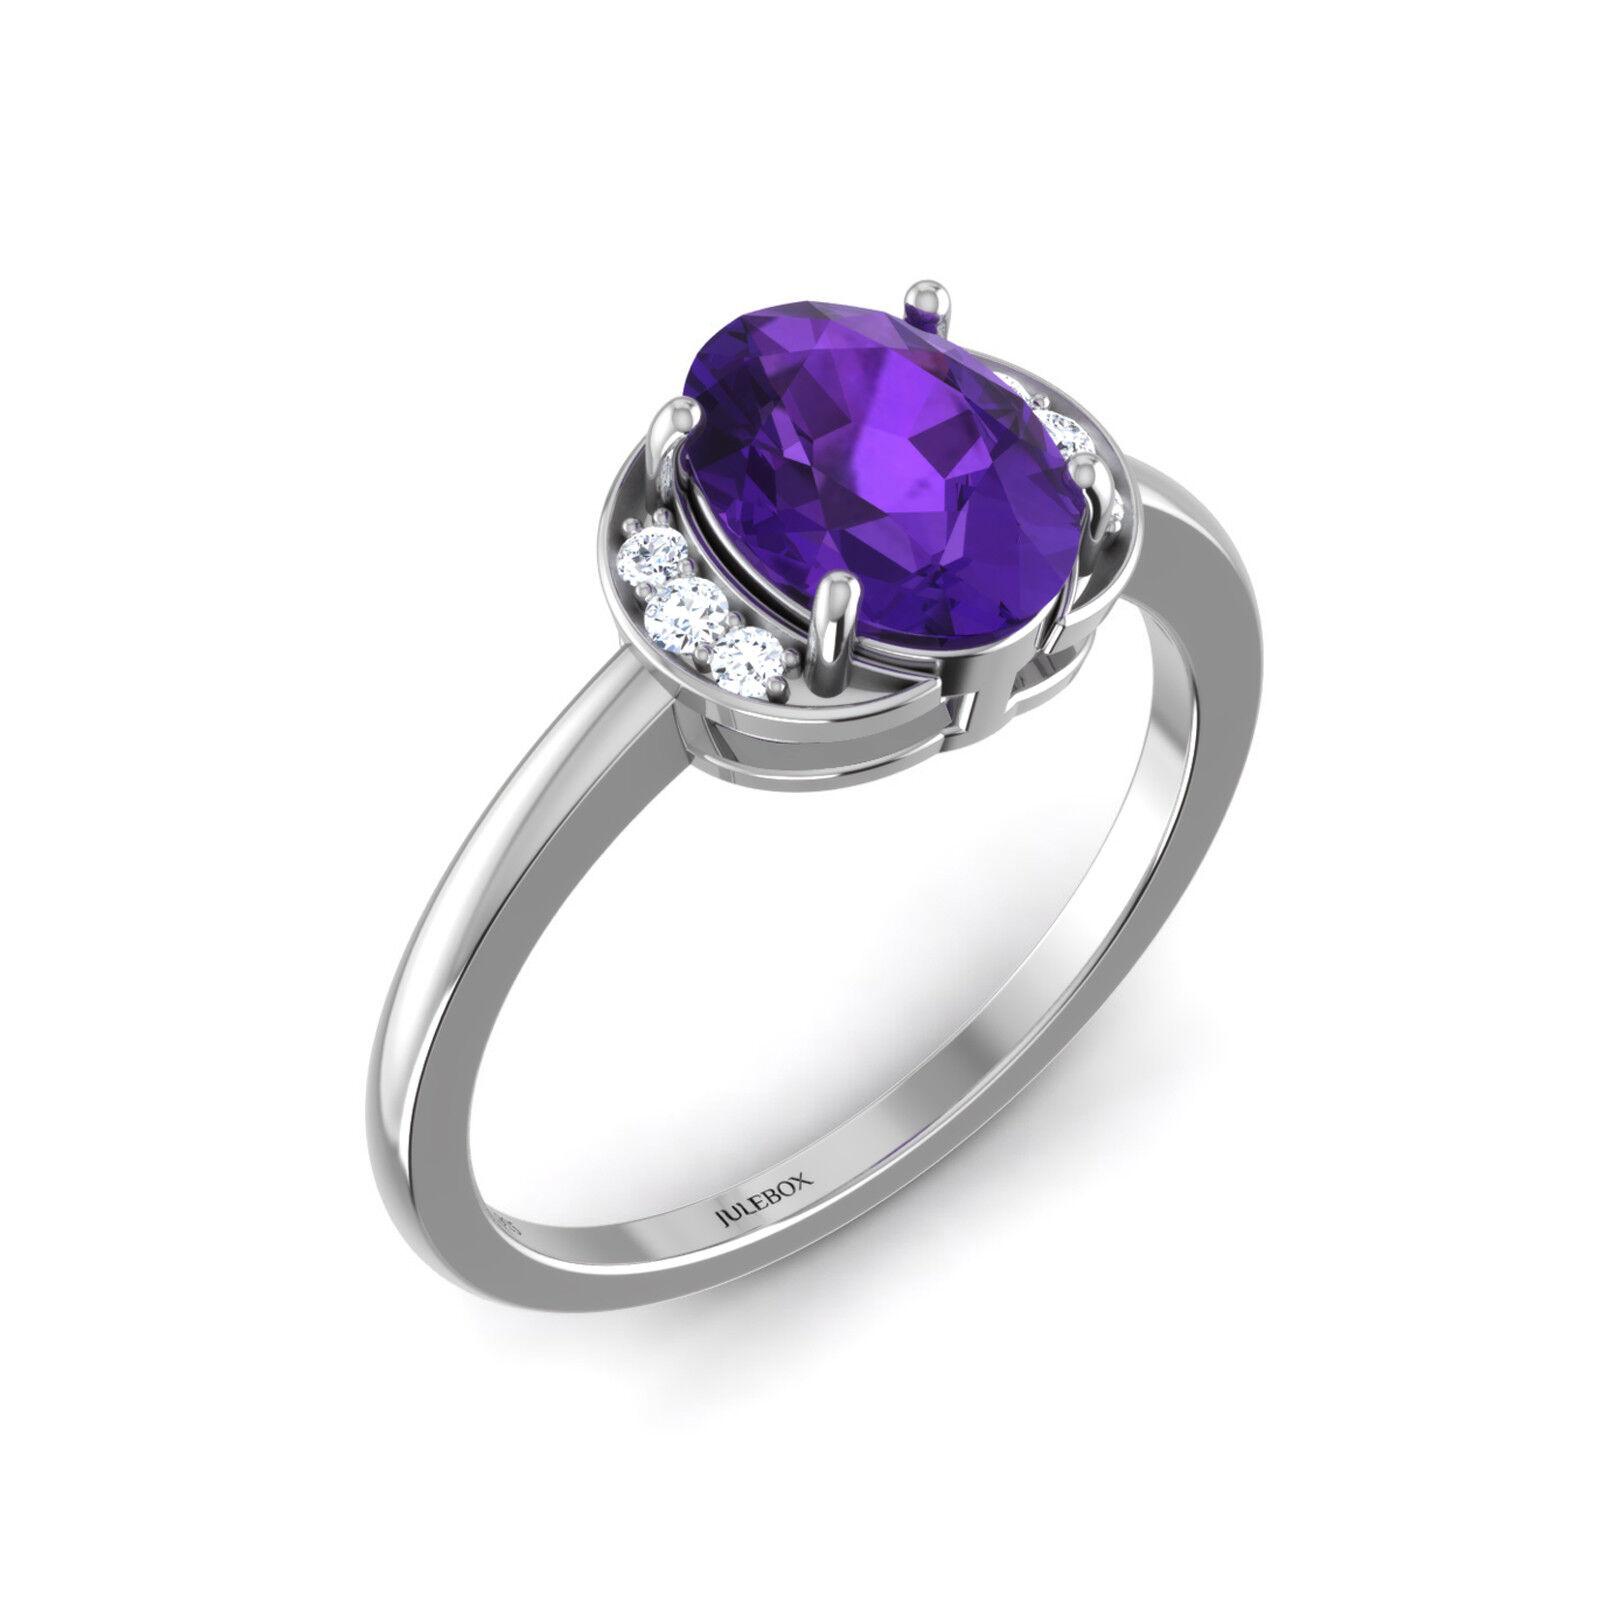 NEW Fashion Jewelry Purple Amethyst Wedding Ring Jewellery Women Ladies Rings UK